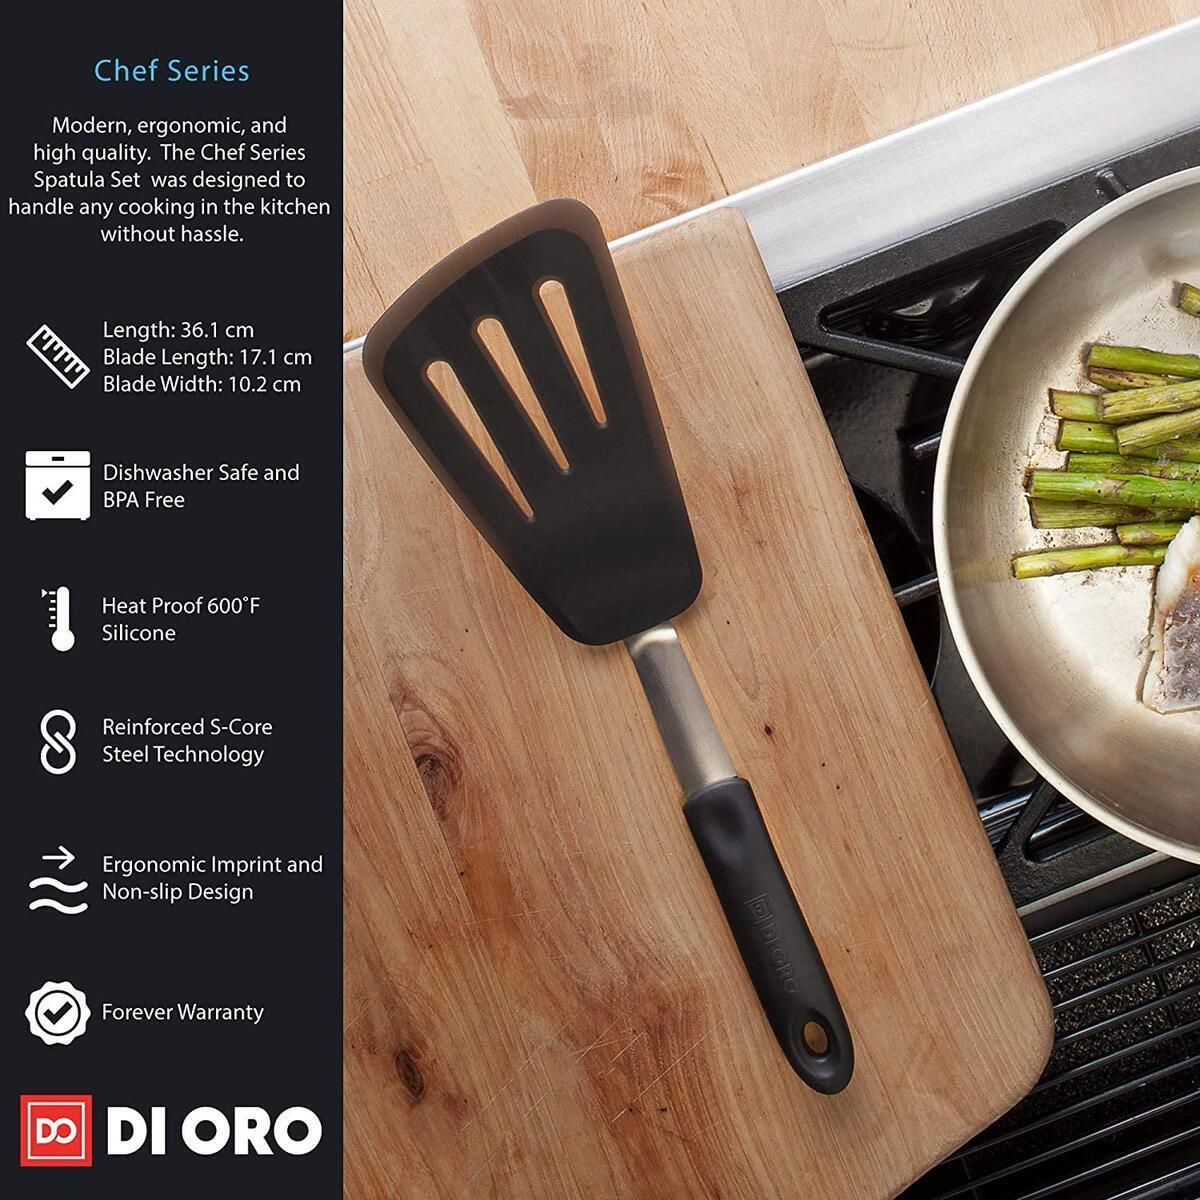 DI ORO Chef Series 3-Piece Silicone Turner Spatula Set - 600F Heat-Resistant Flexible Rubber Silicone Spatulas - Silicone Cooking Utensil Set - Egg Turners, Pancake Flippers, Kitchen Spatulas